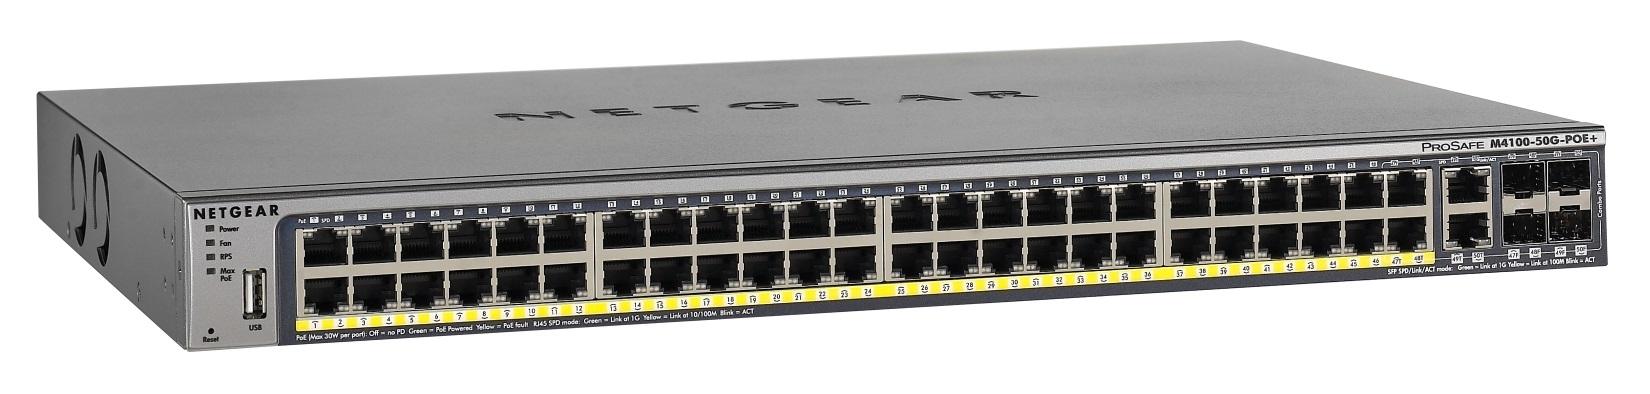 Netgear M4100-50G-POE+ L2 Managed Switch 50-Port PoE+ Gigabit (GSM7248P)